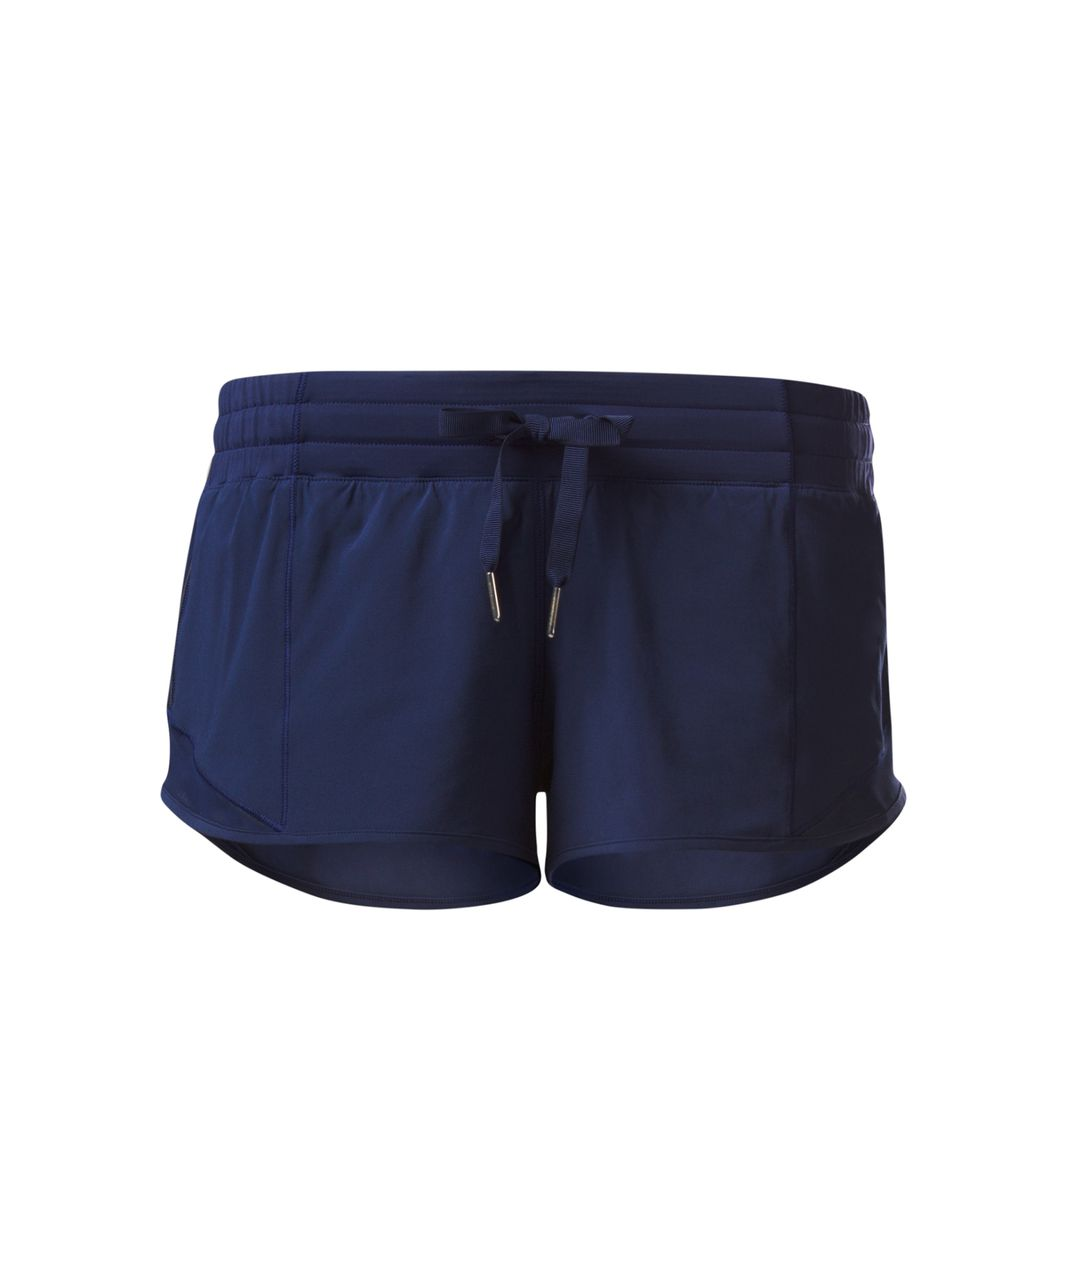 Lululemon Hotty Hot Short - Hero Blue